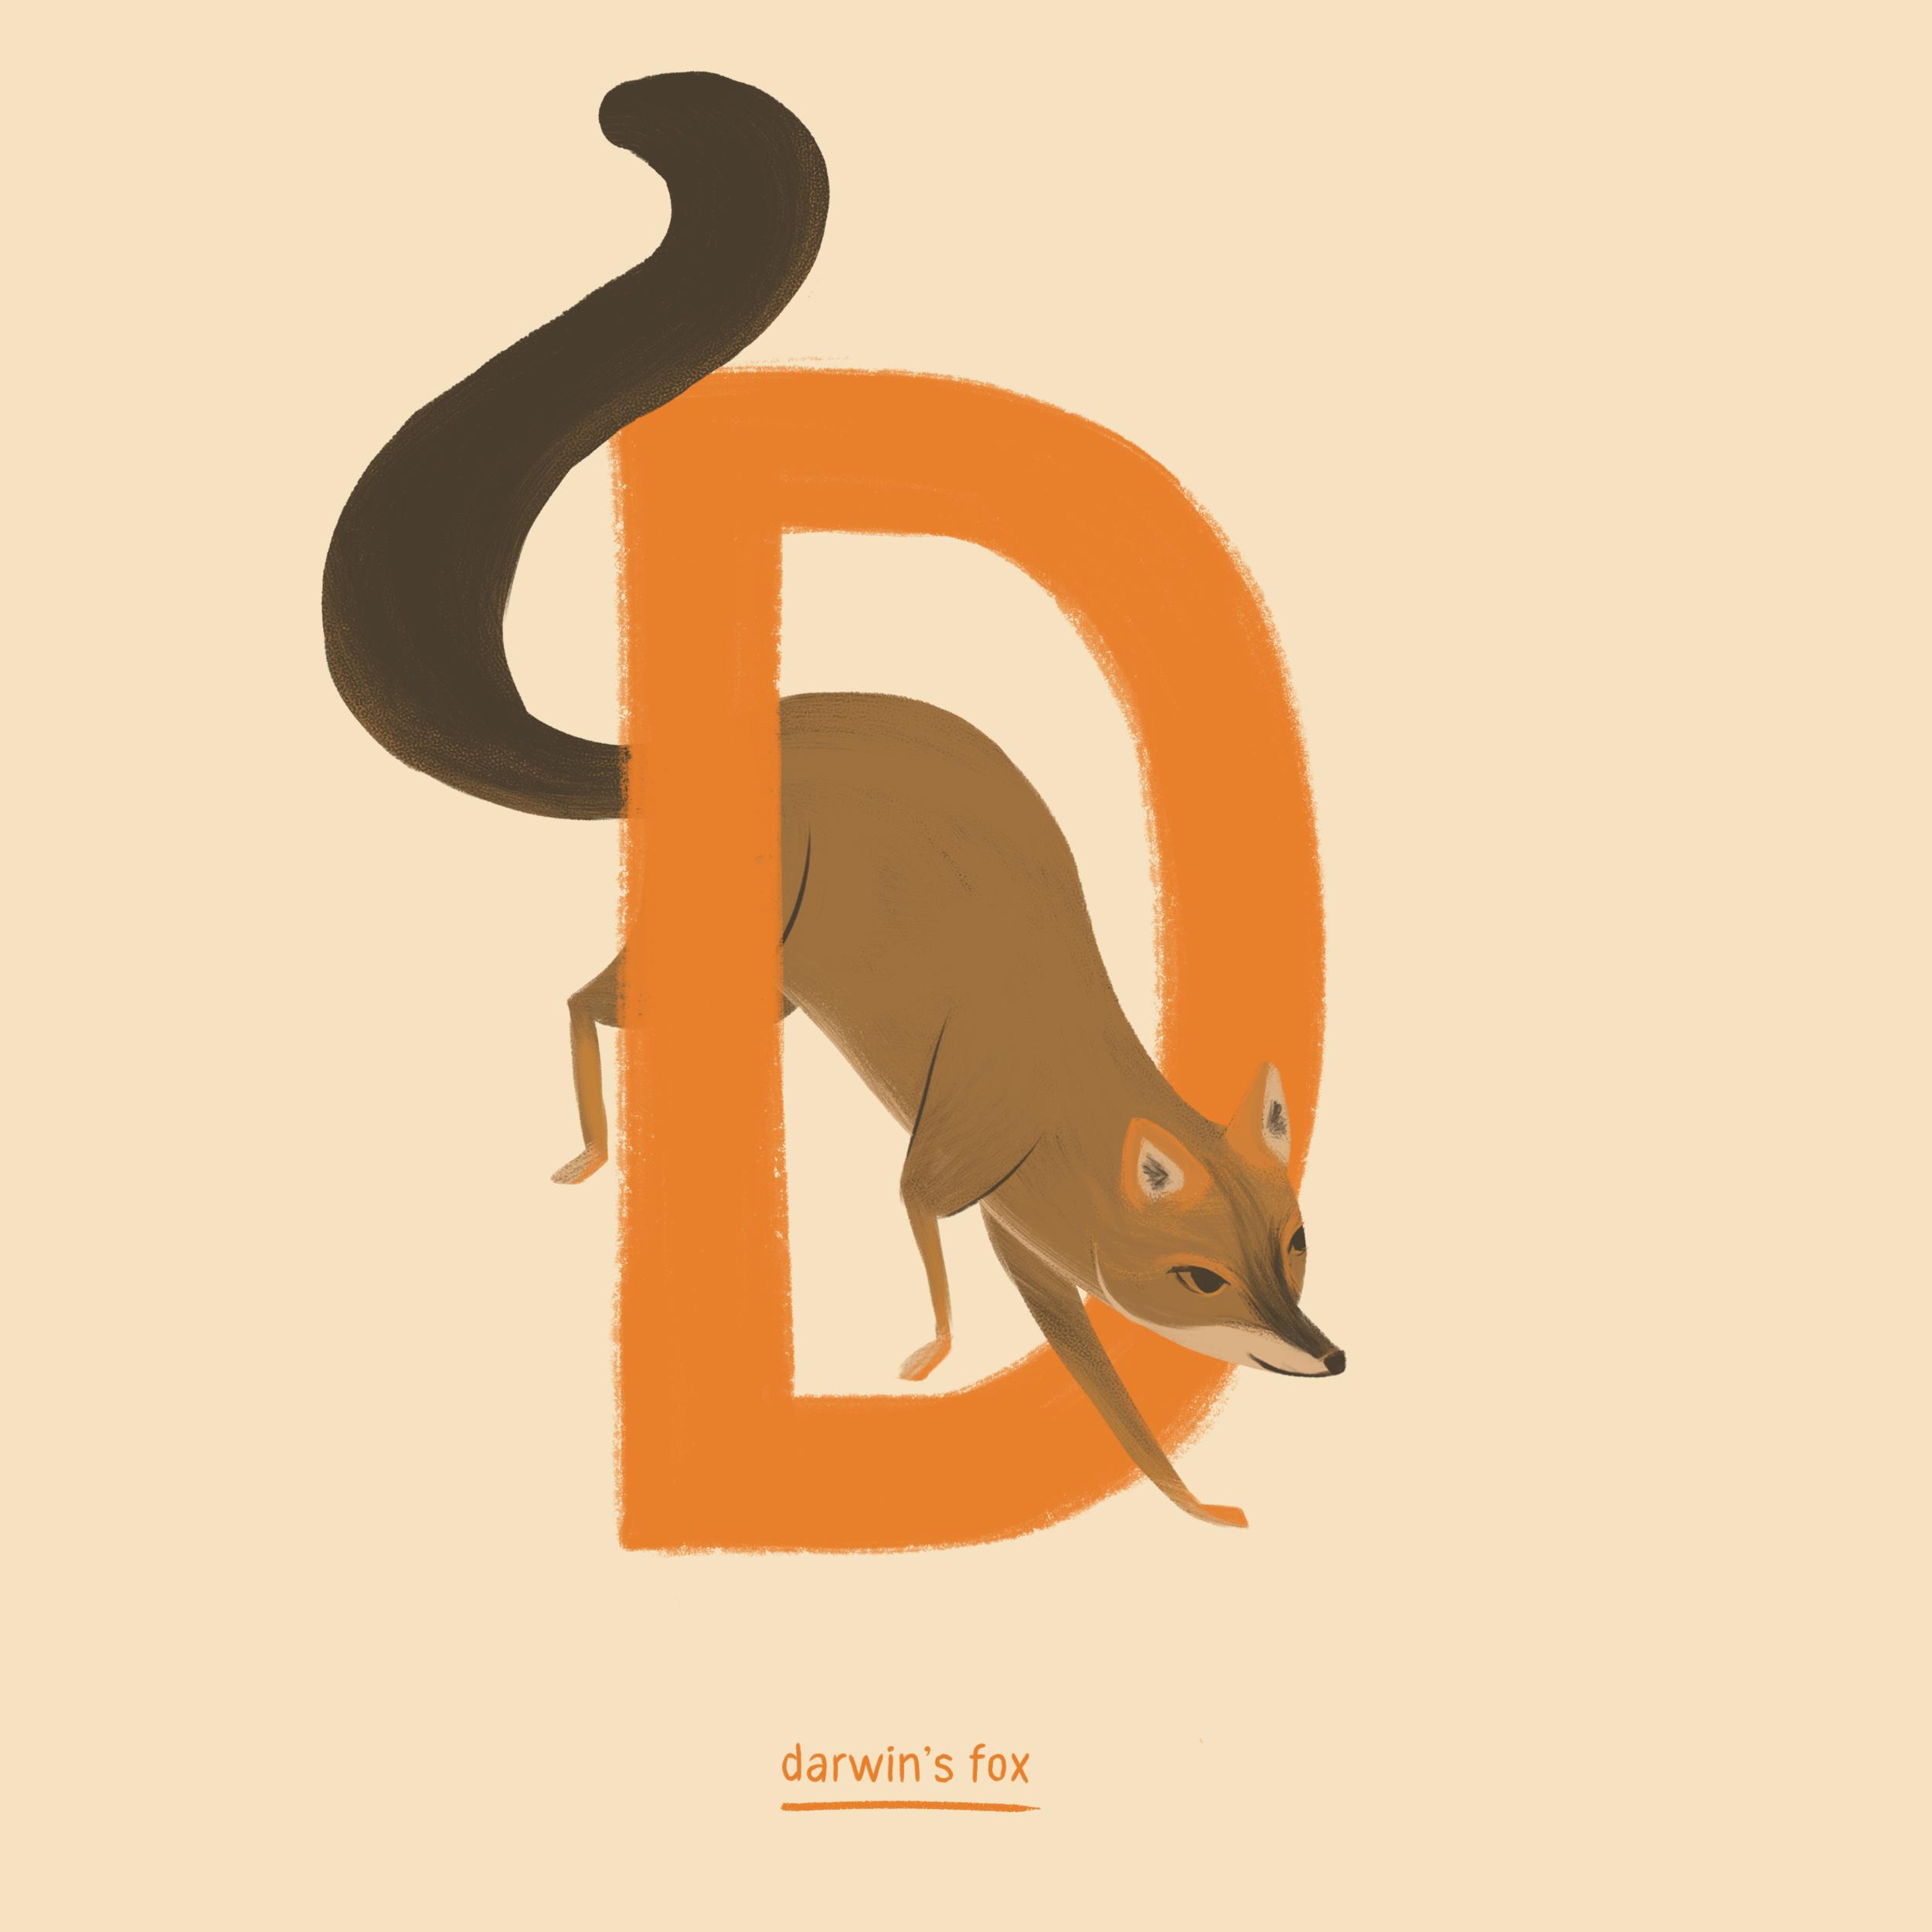 Darwins fox.png